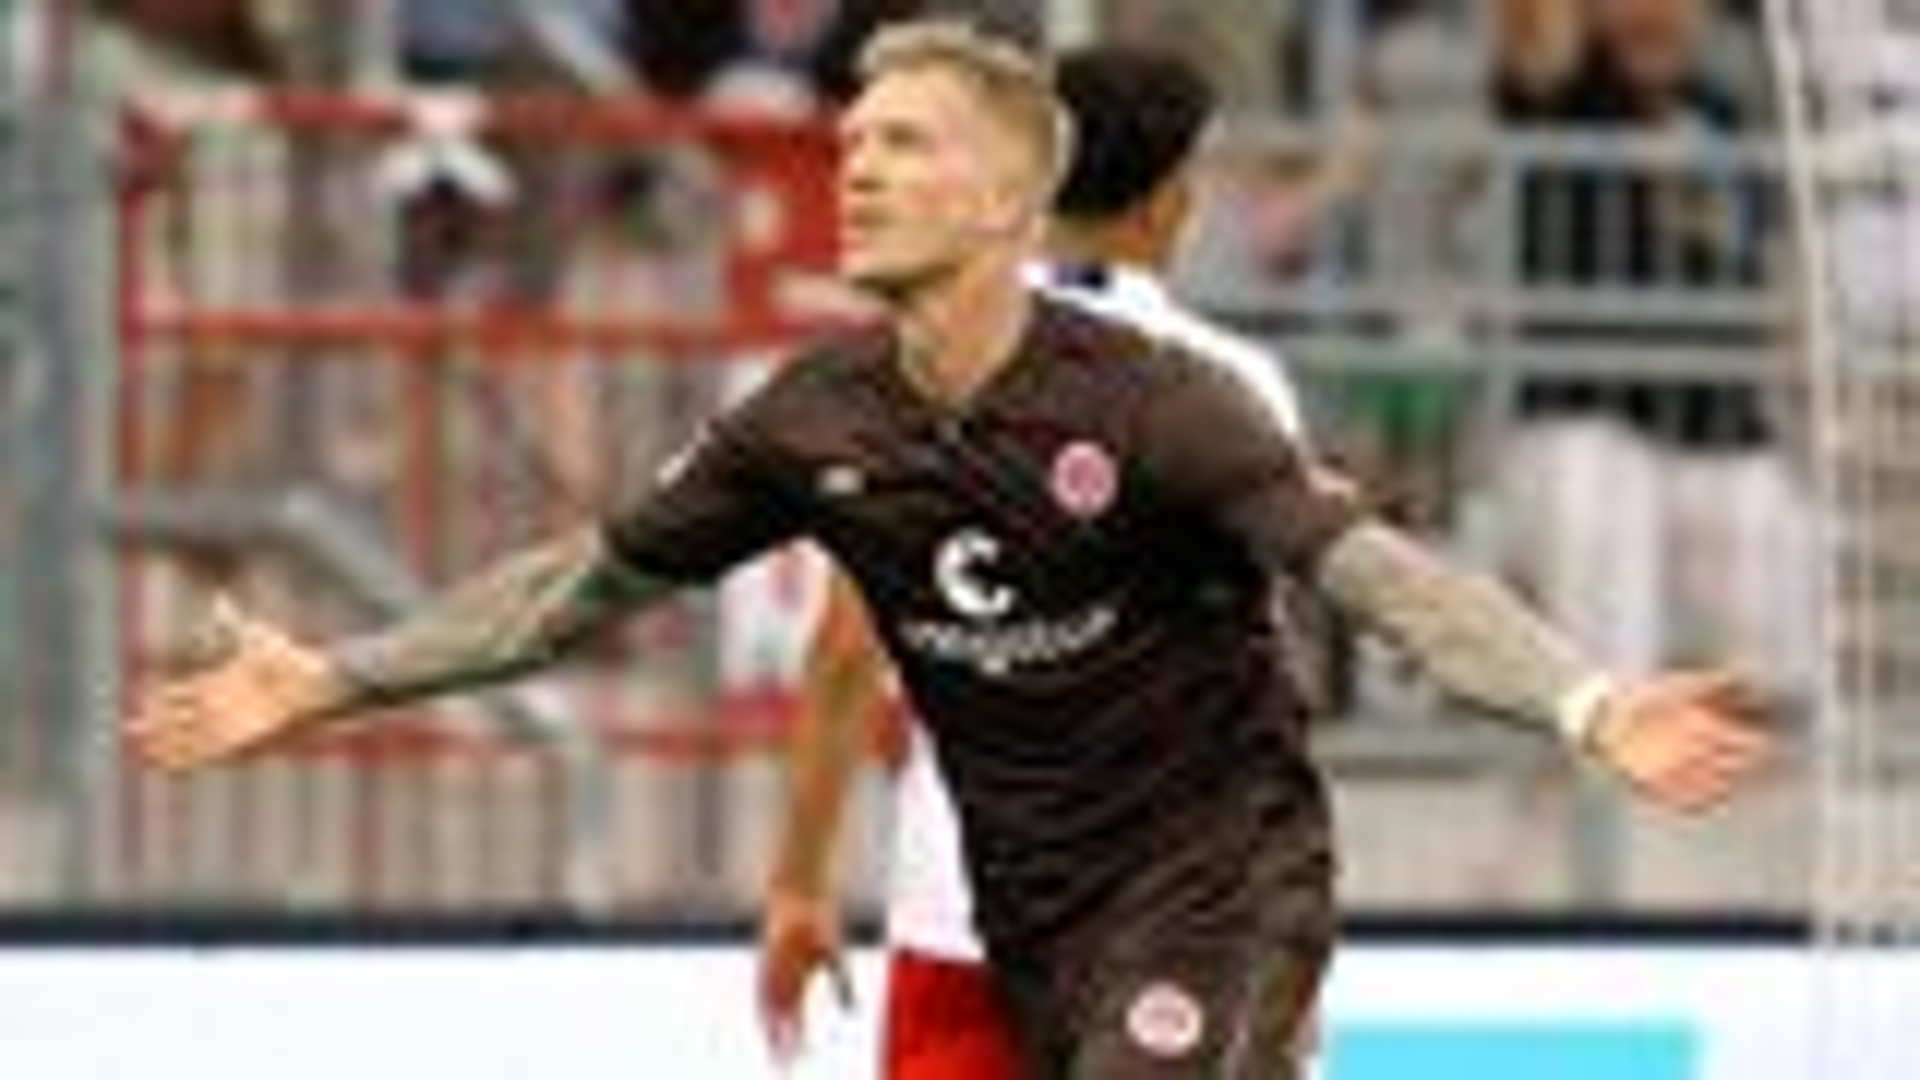 Bundesliga 2, Matchday 3 round-up: Makienok the hero as St. Pauli win city derby